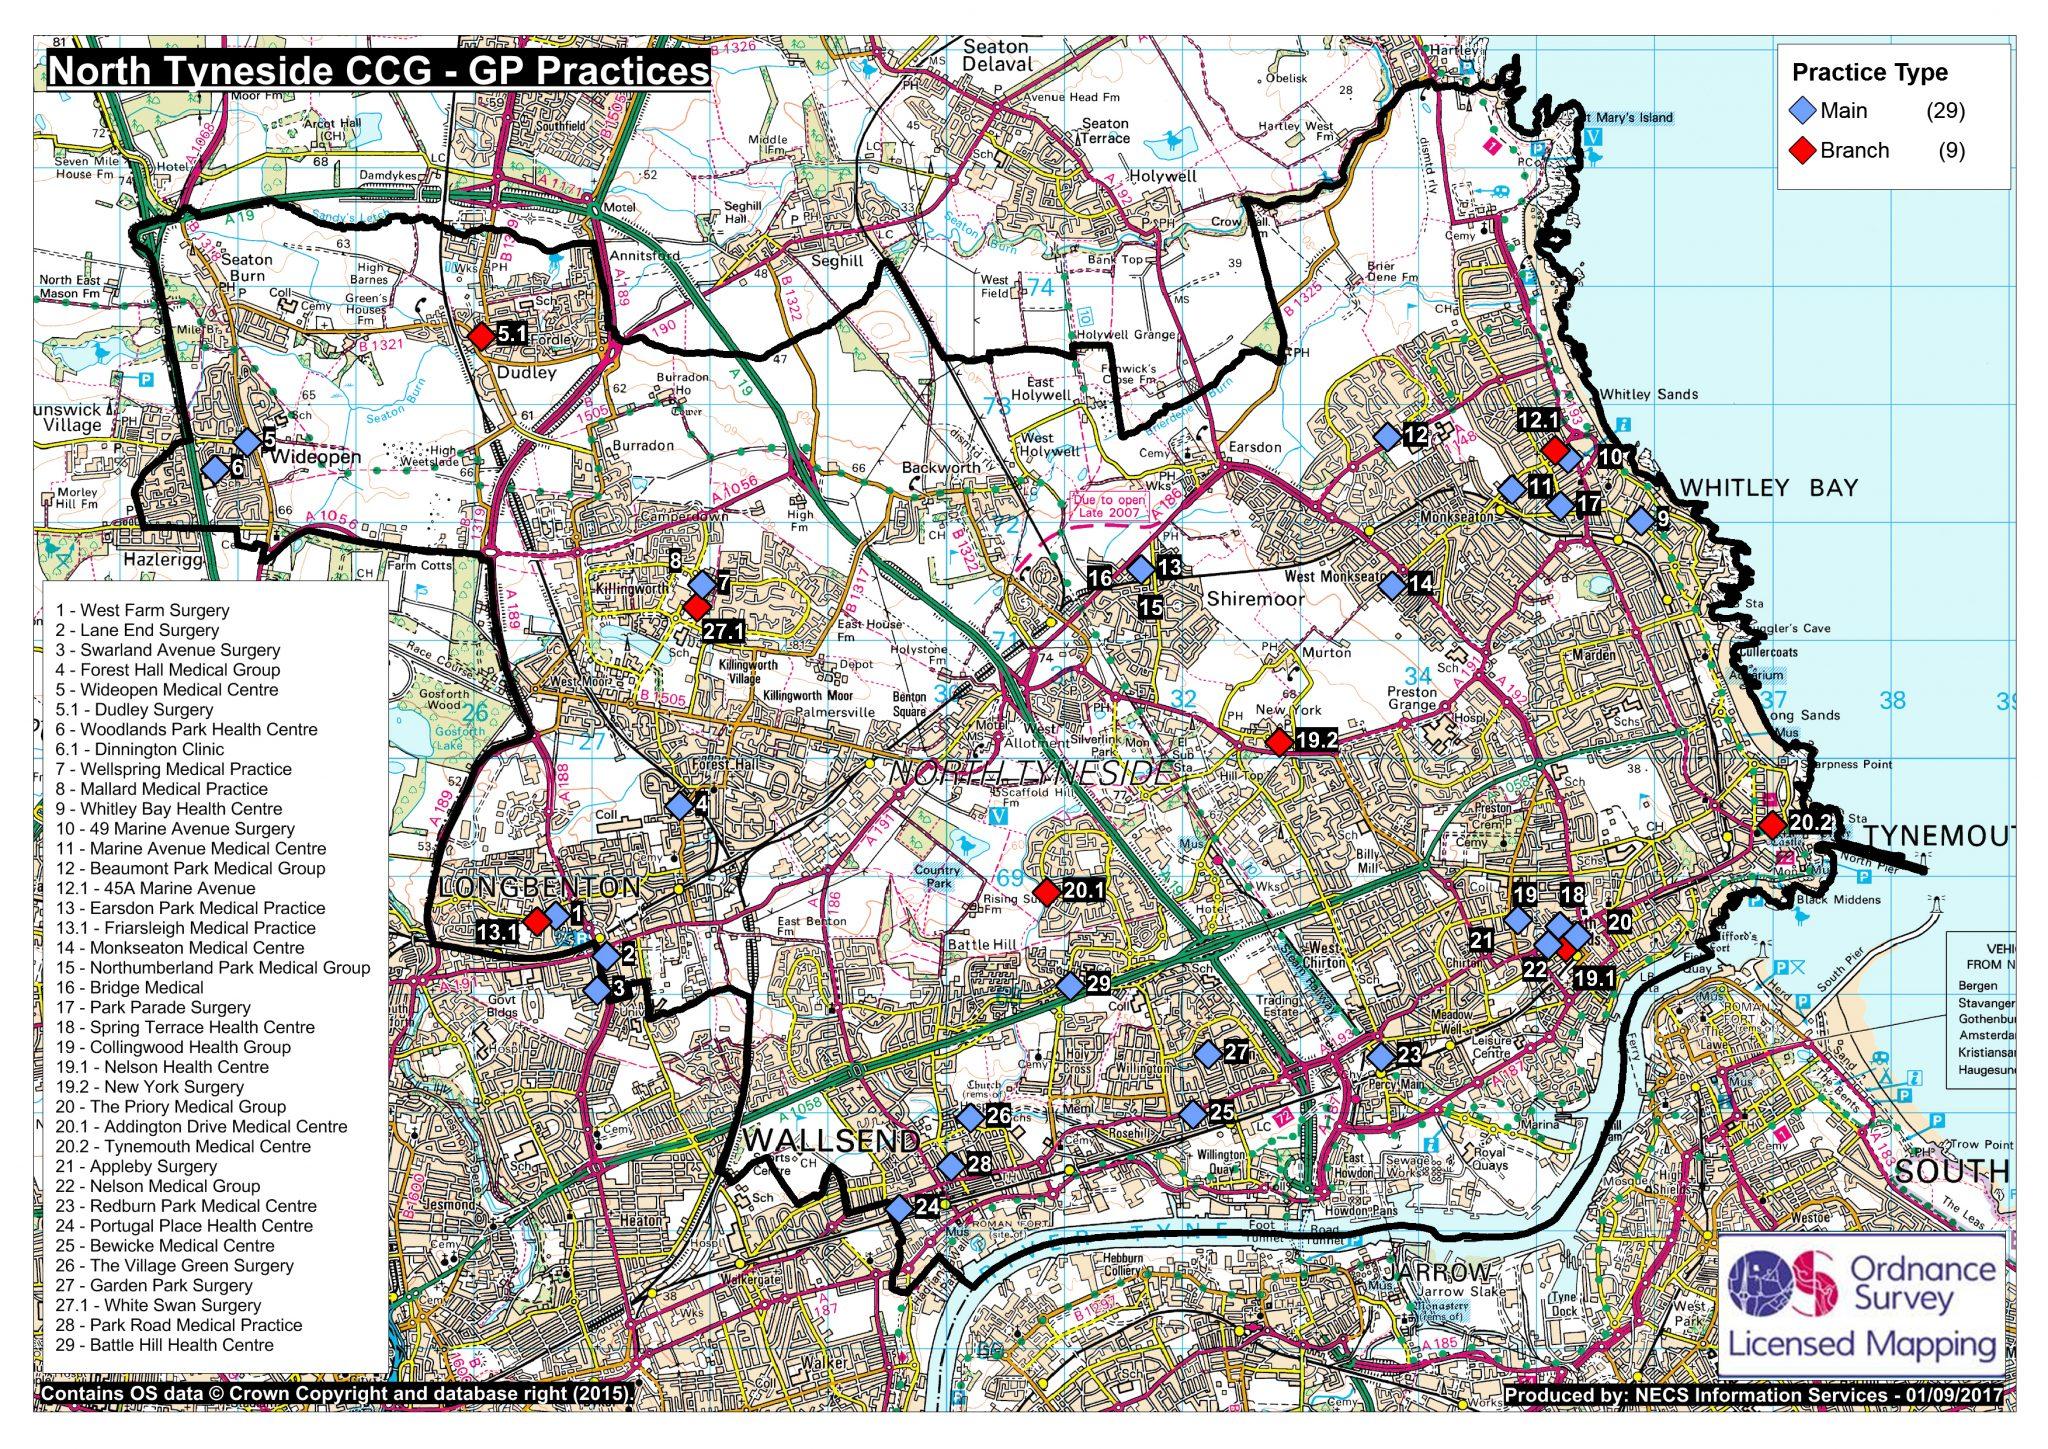 GP Practice (map view area) - North Tyneside CCG